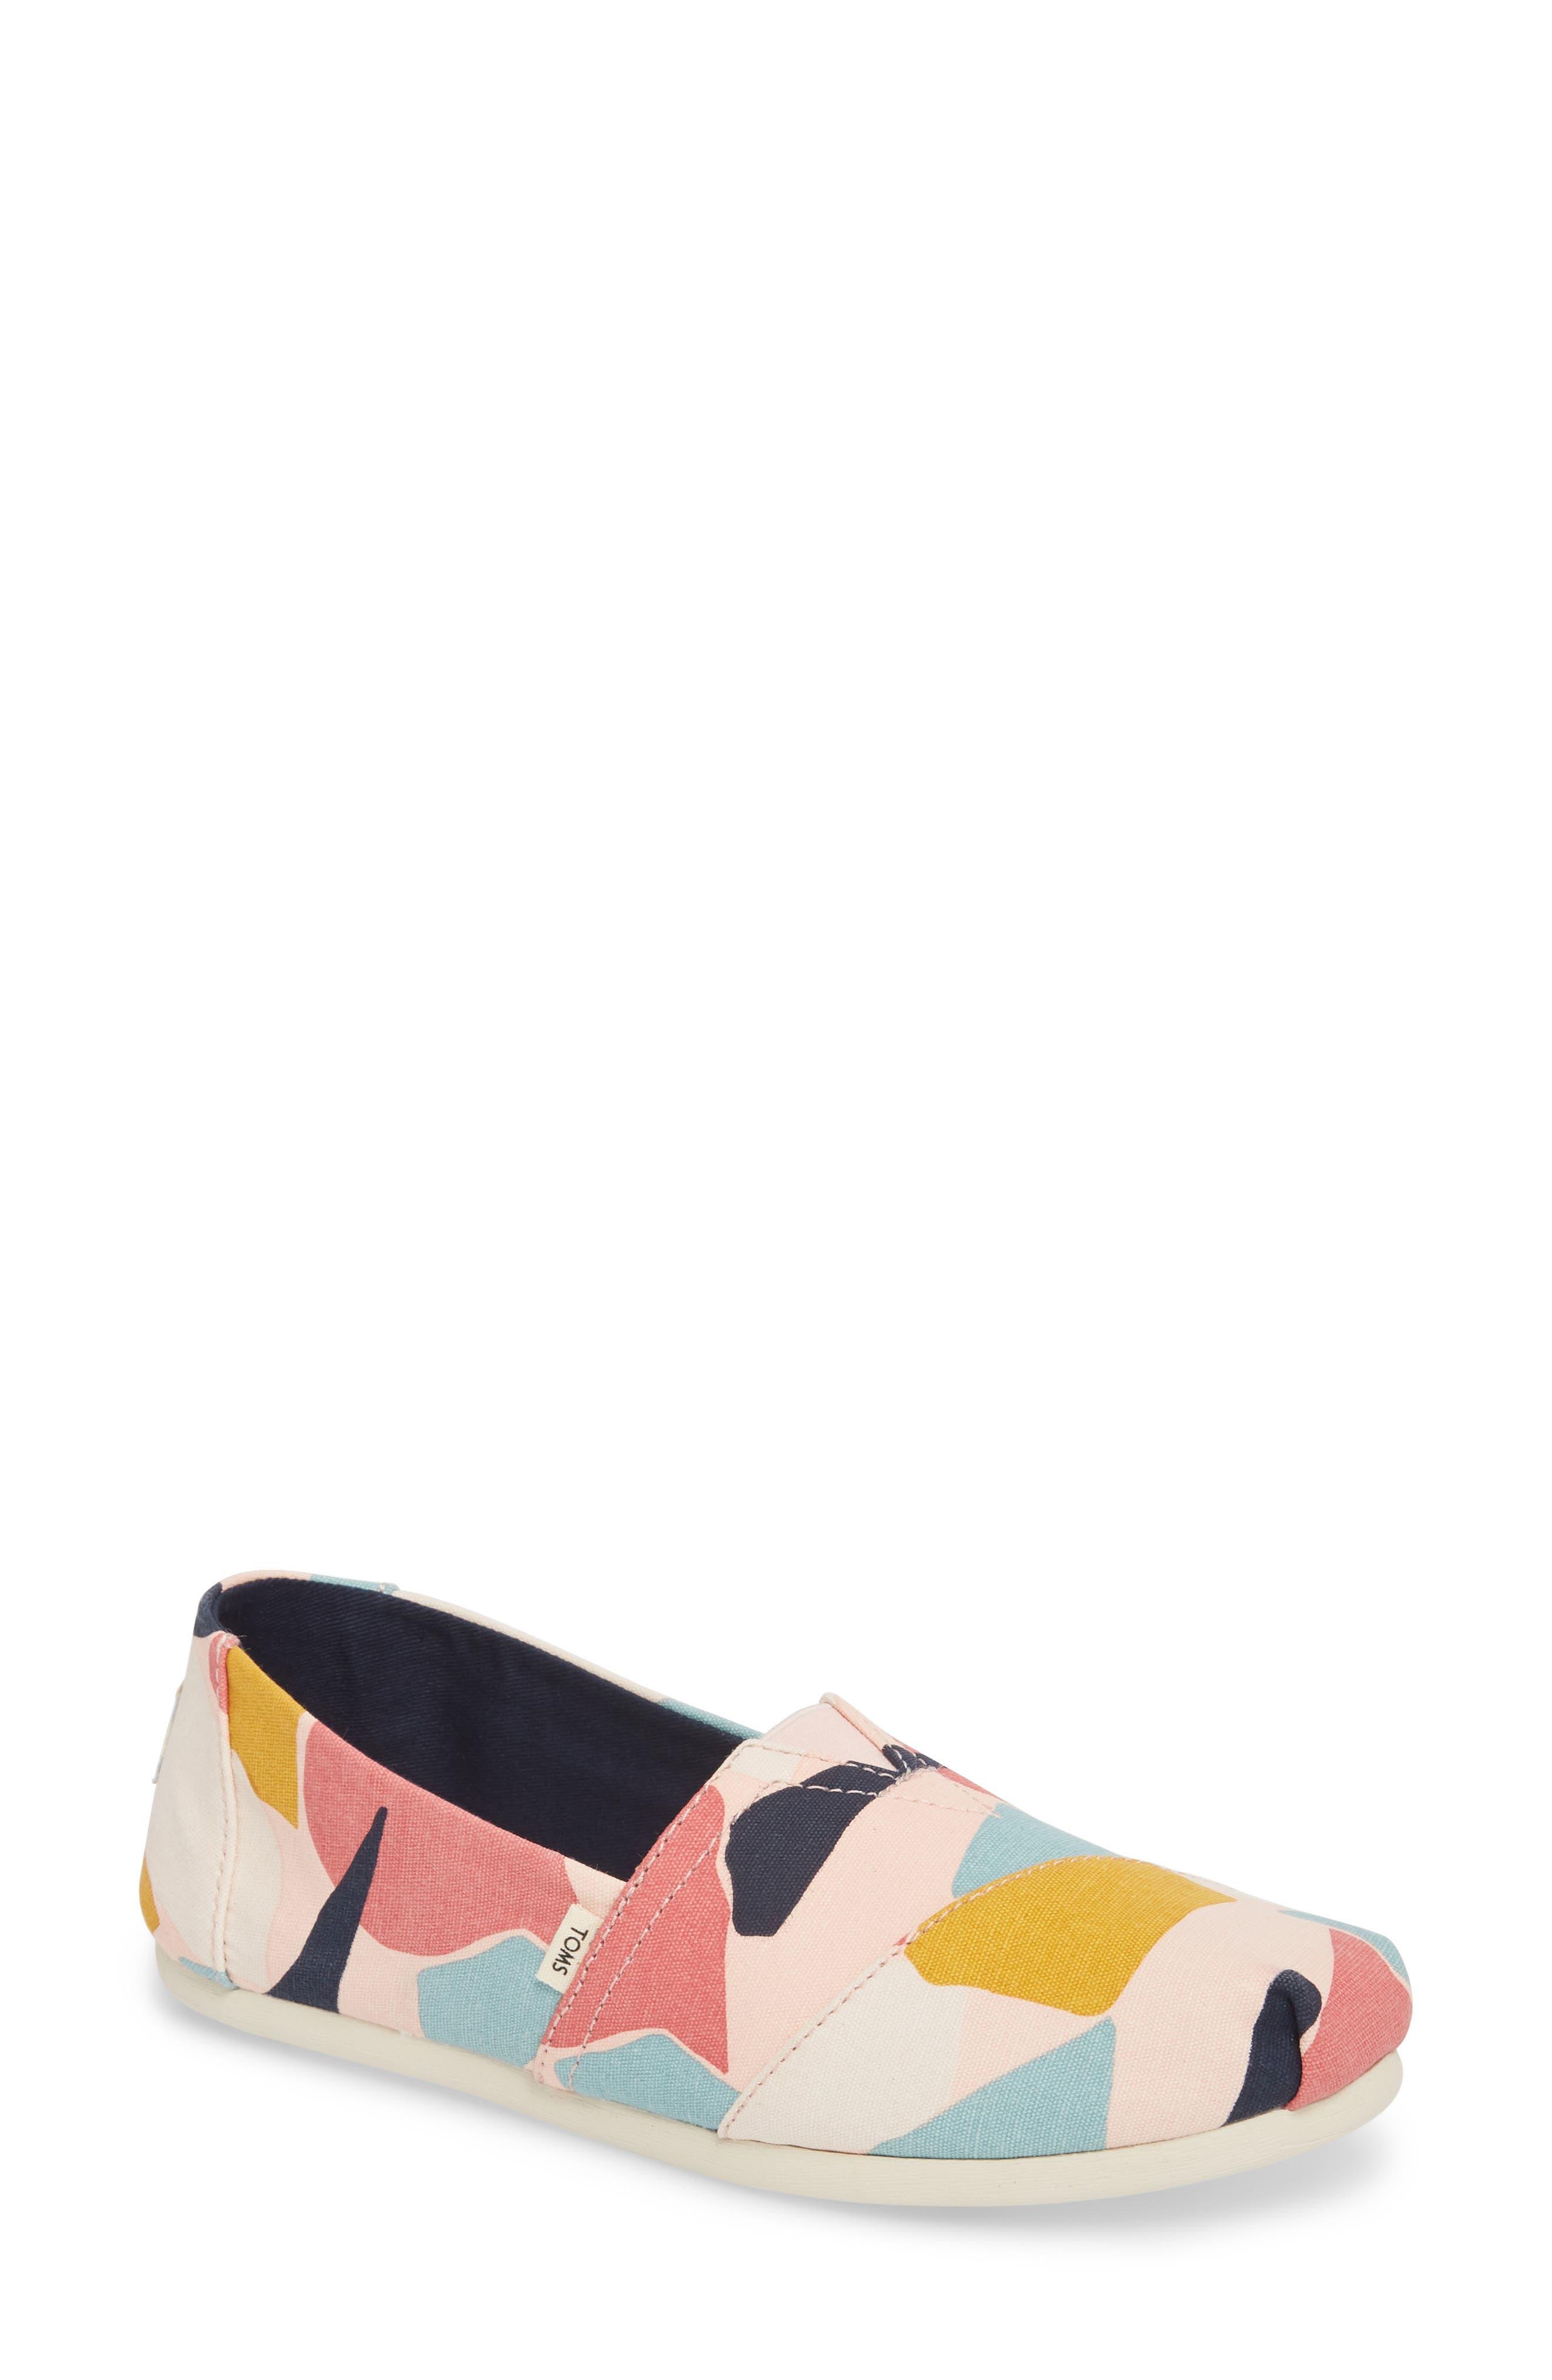 Alpargata Slip-On Sneaker,                         Main,                         color, ROSE GLOW PRINT CANVAS